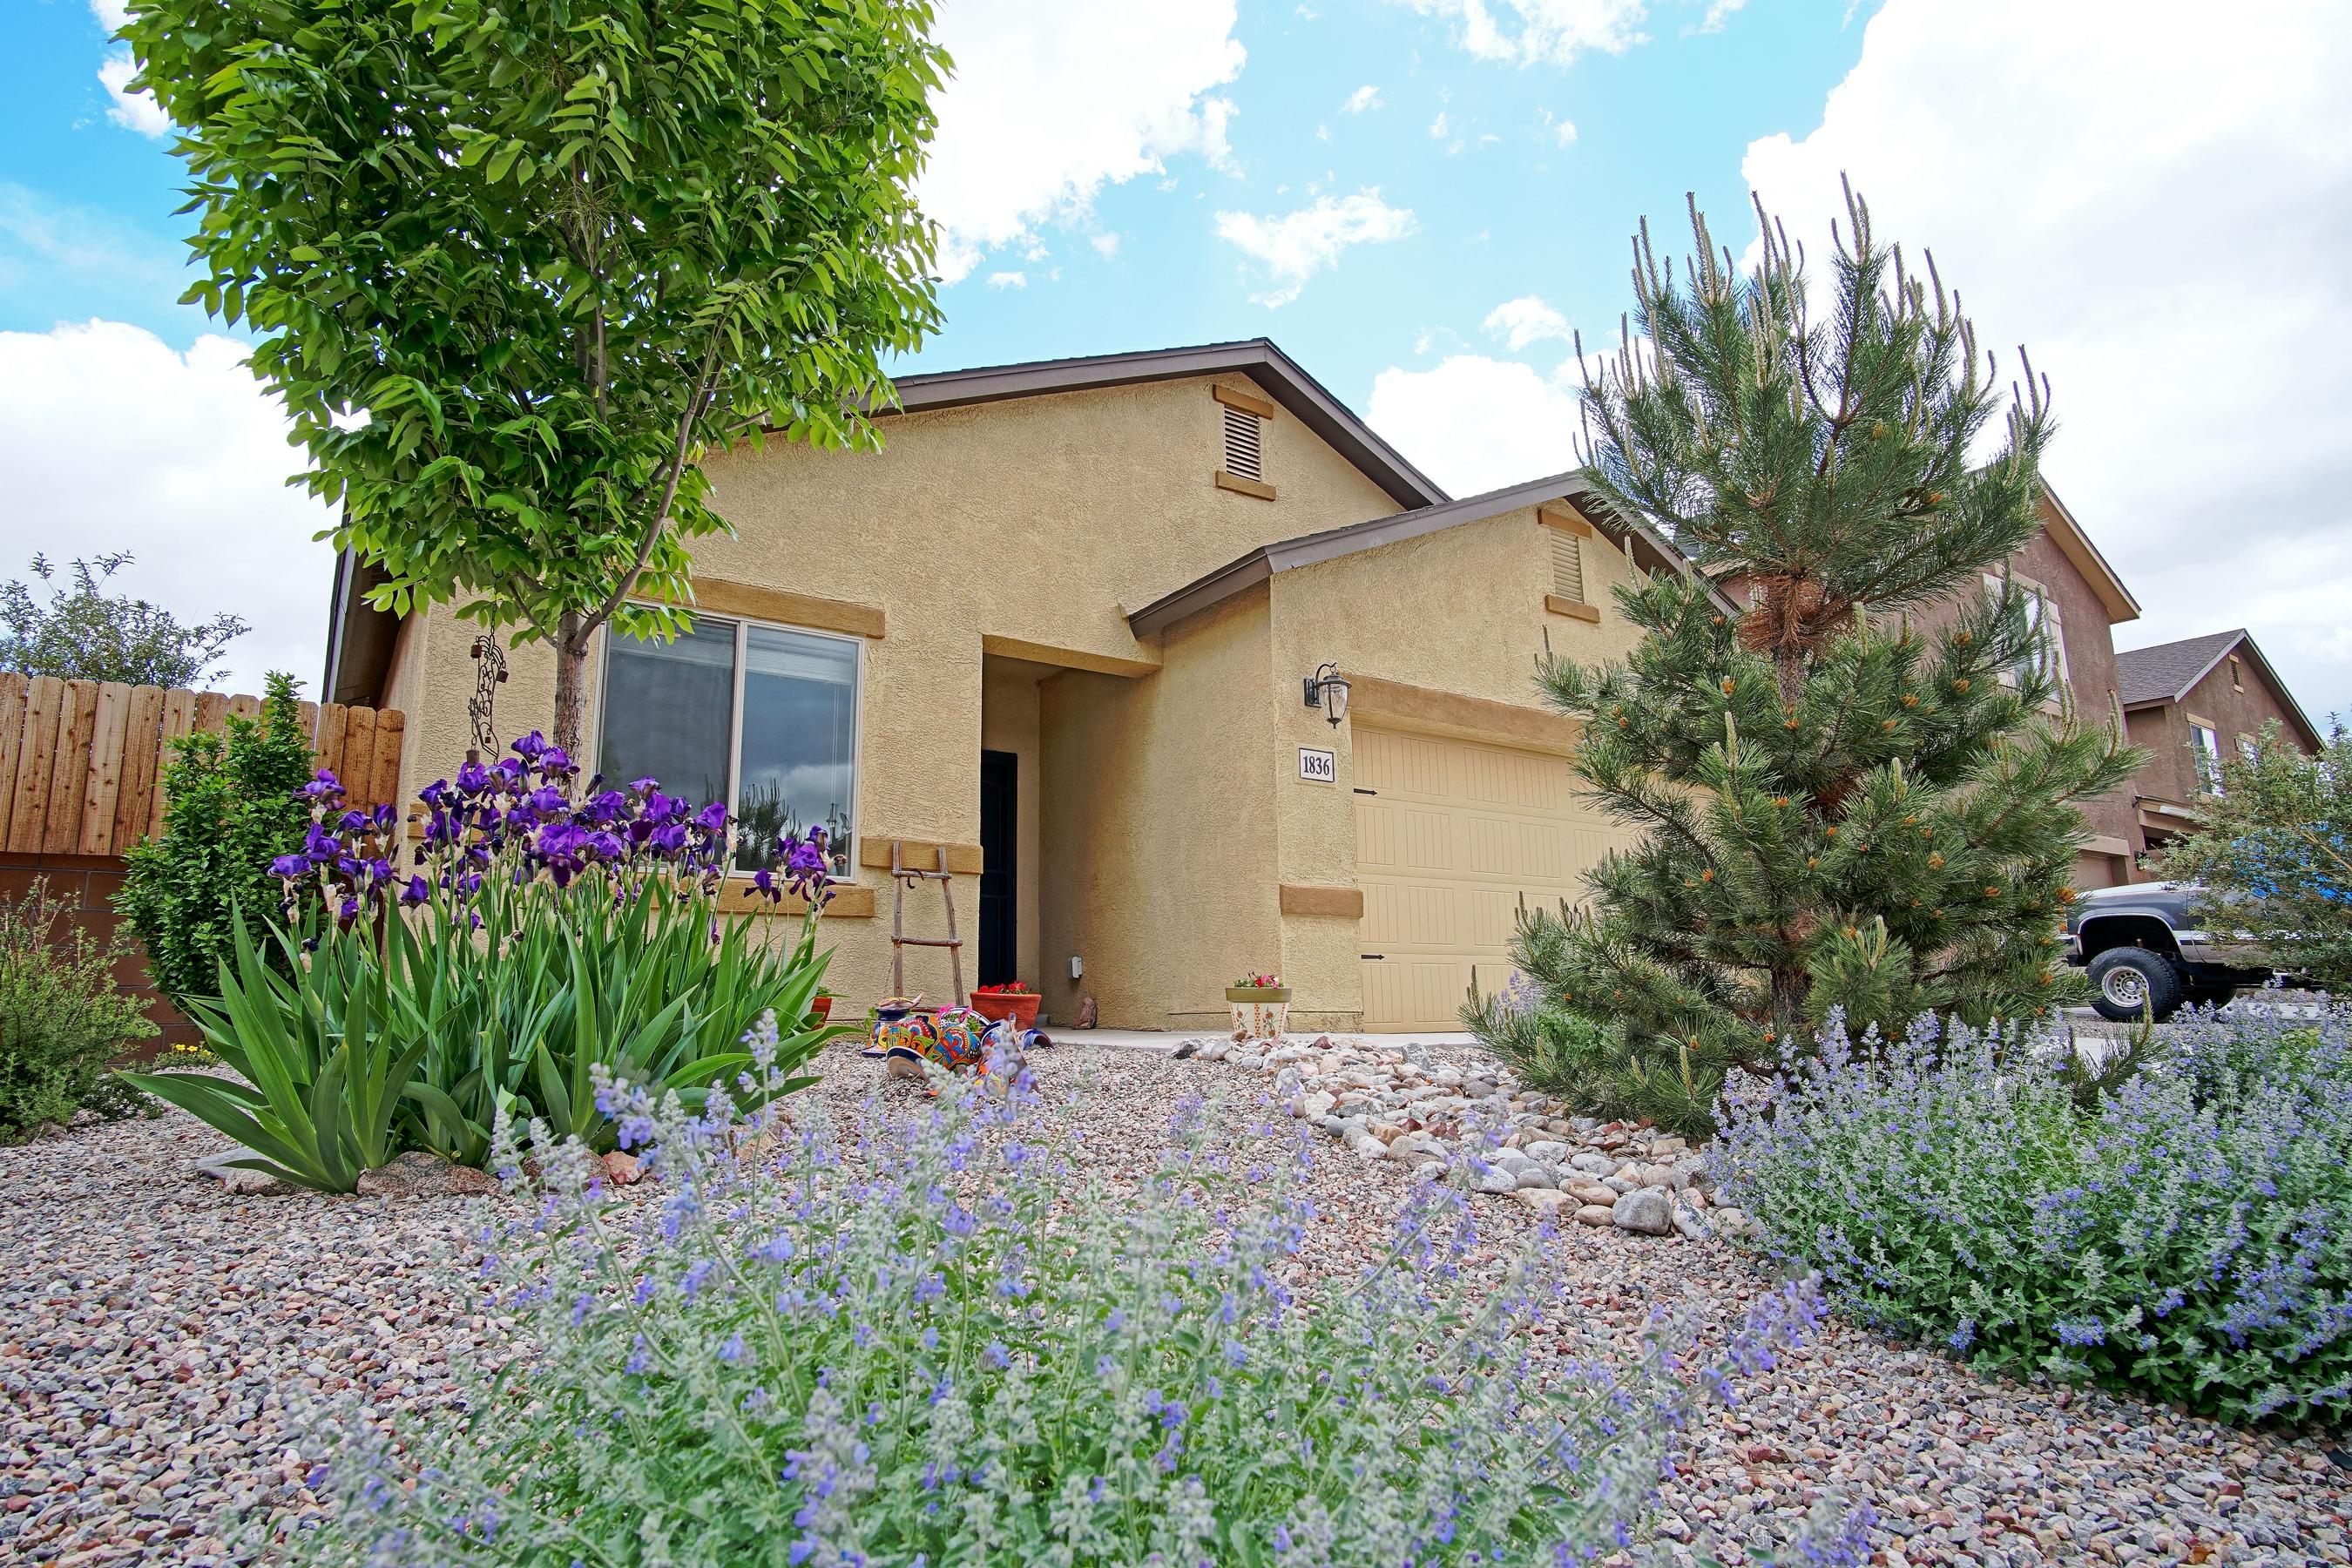 1836 NE Chisholm Trail, Rio Rancho in Sandoval County, NM 87144 Home for Sale